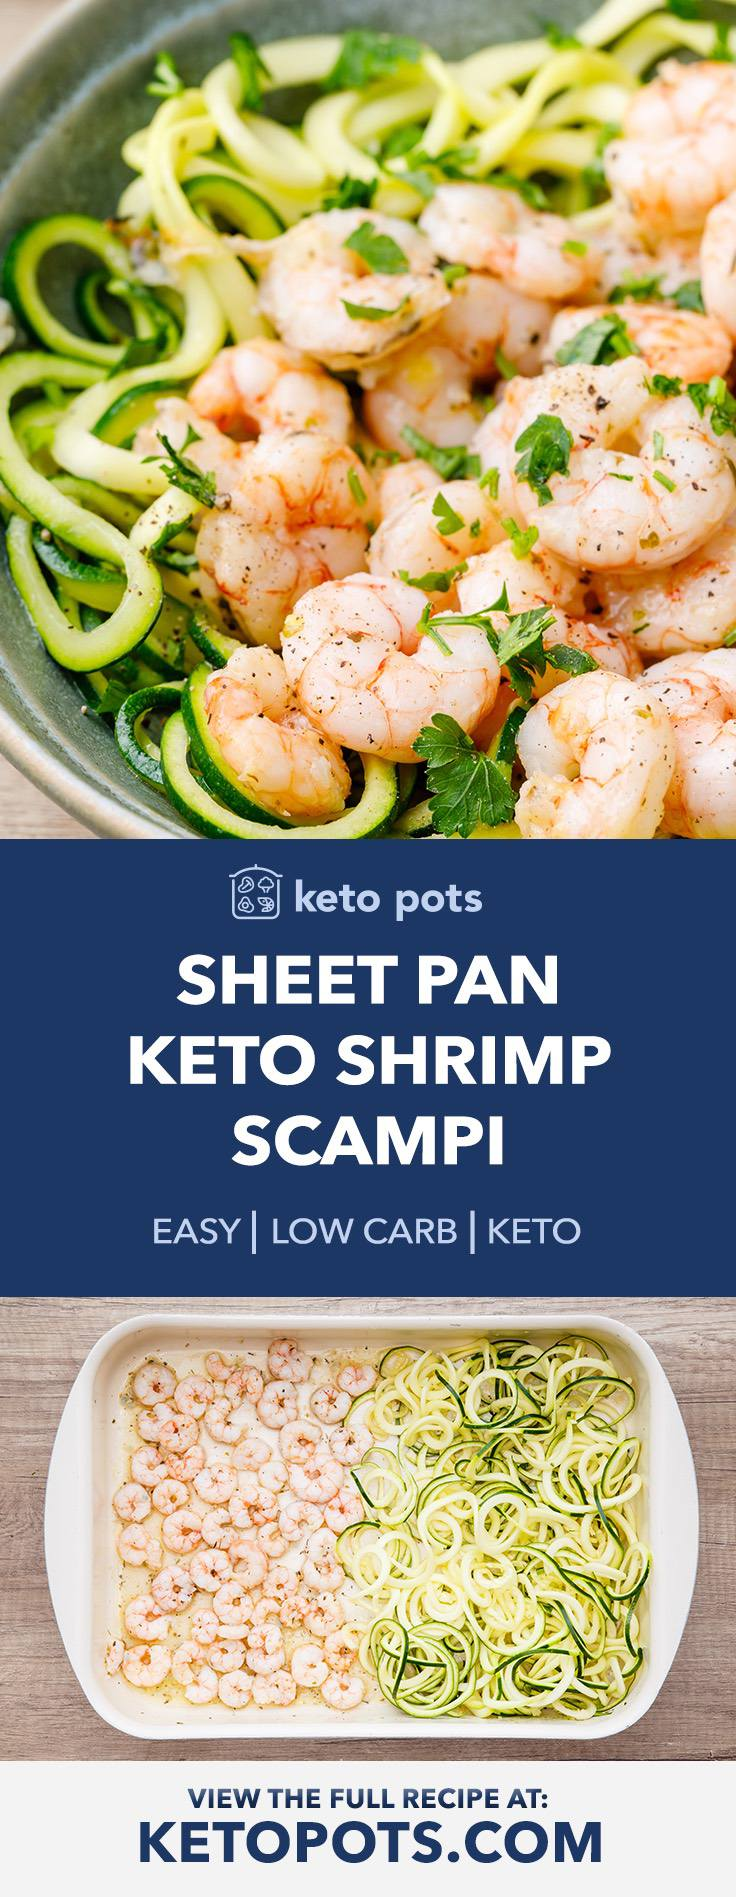 No Hassle Sheet Pan Keto Shrimp Scampi